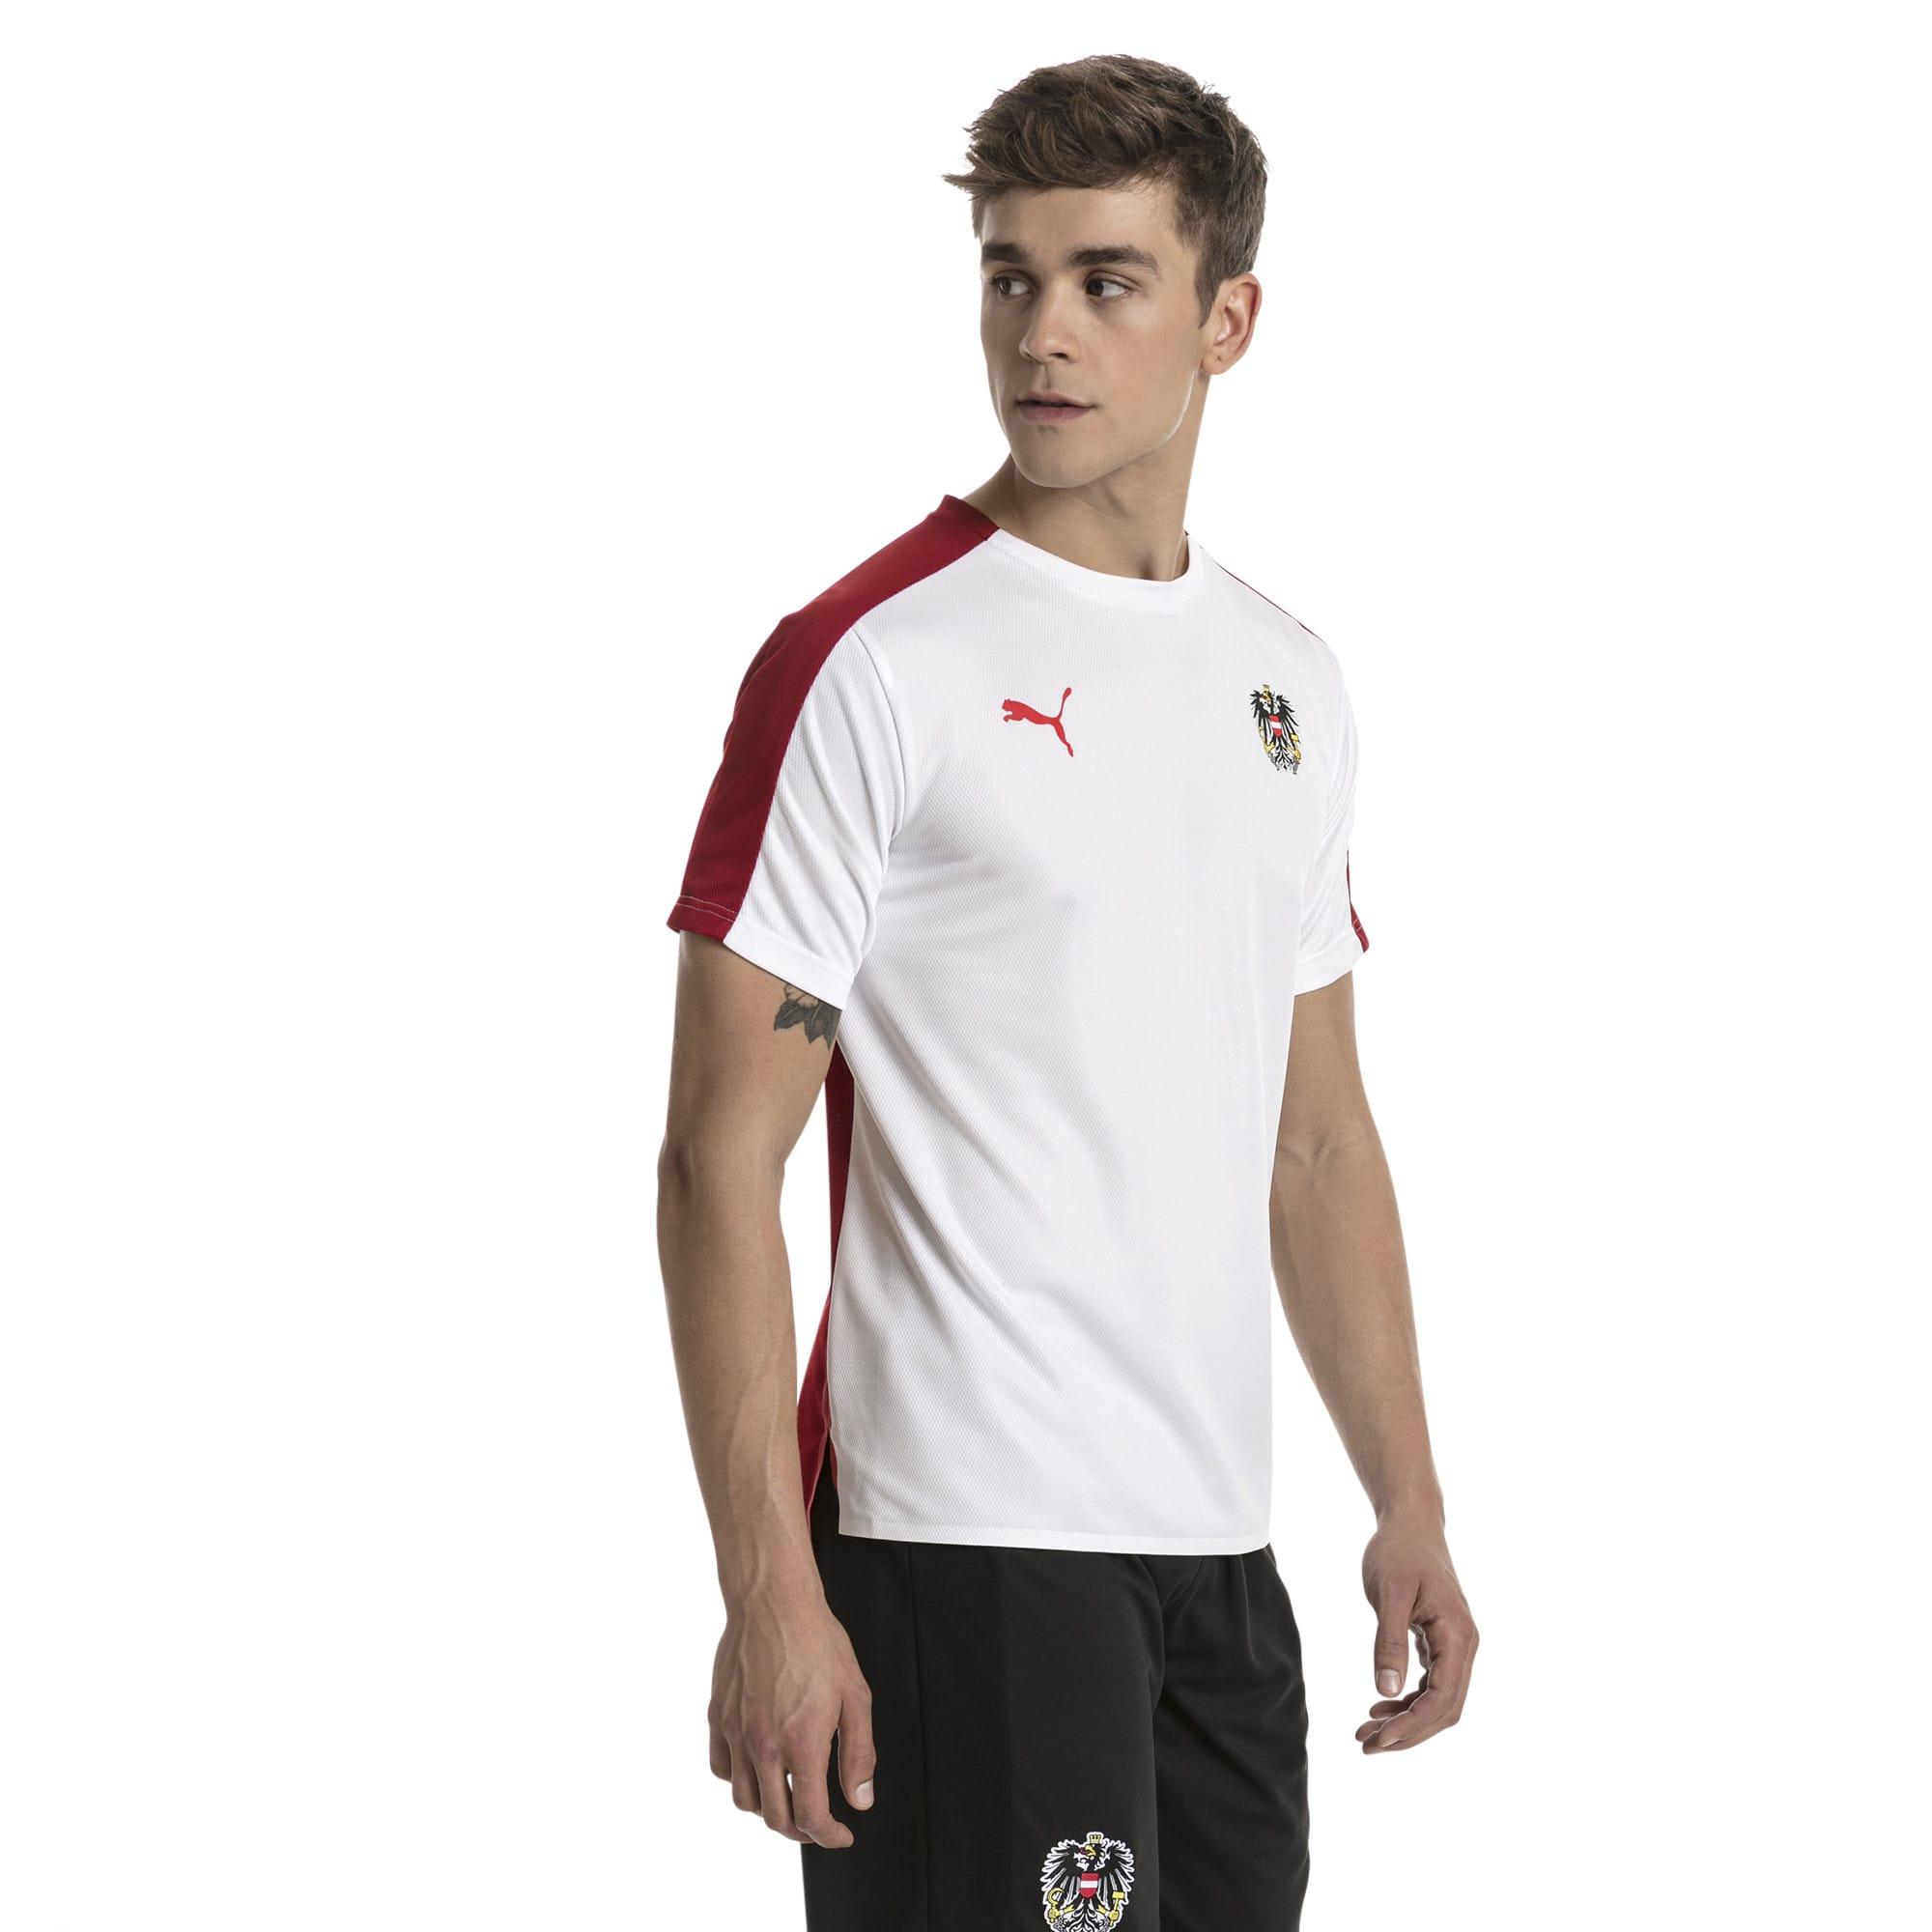 Austria National Team AWAY Football Shirt XXL 2XL PUMA BNWT 2016//17